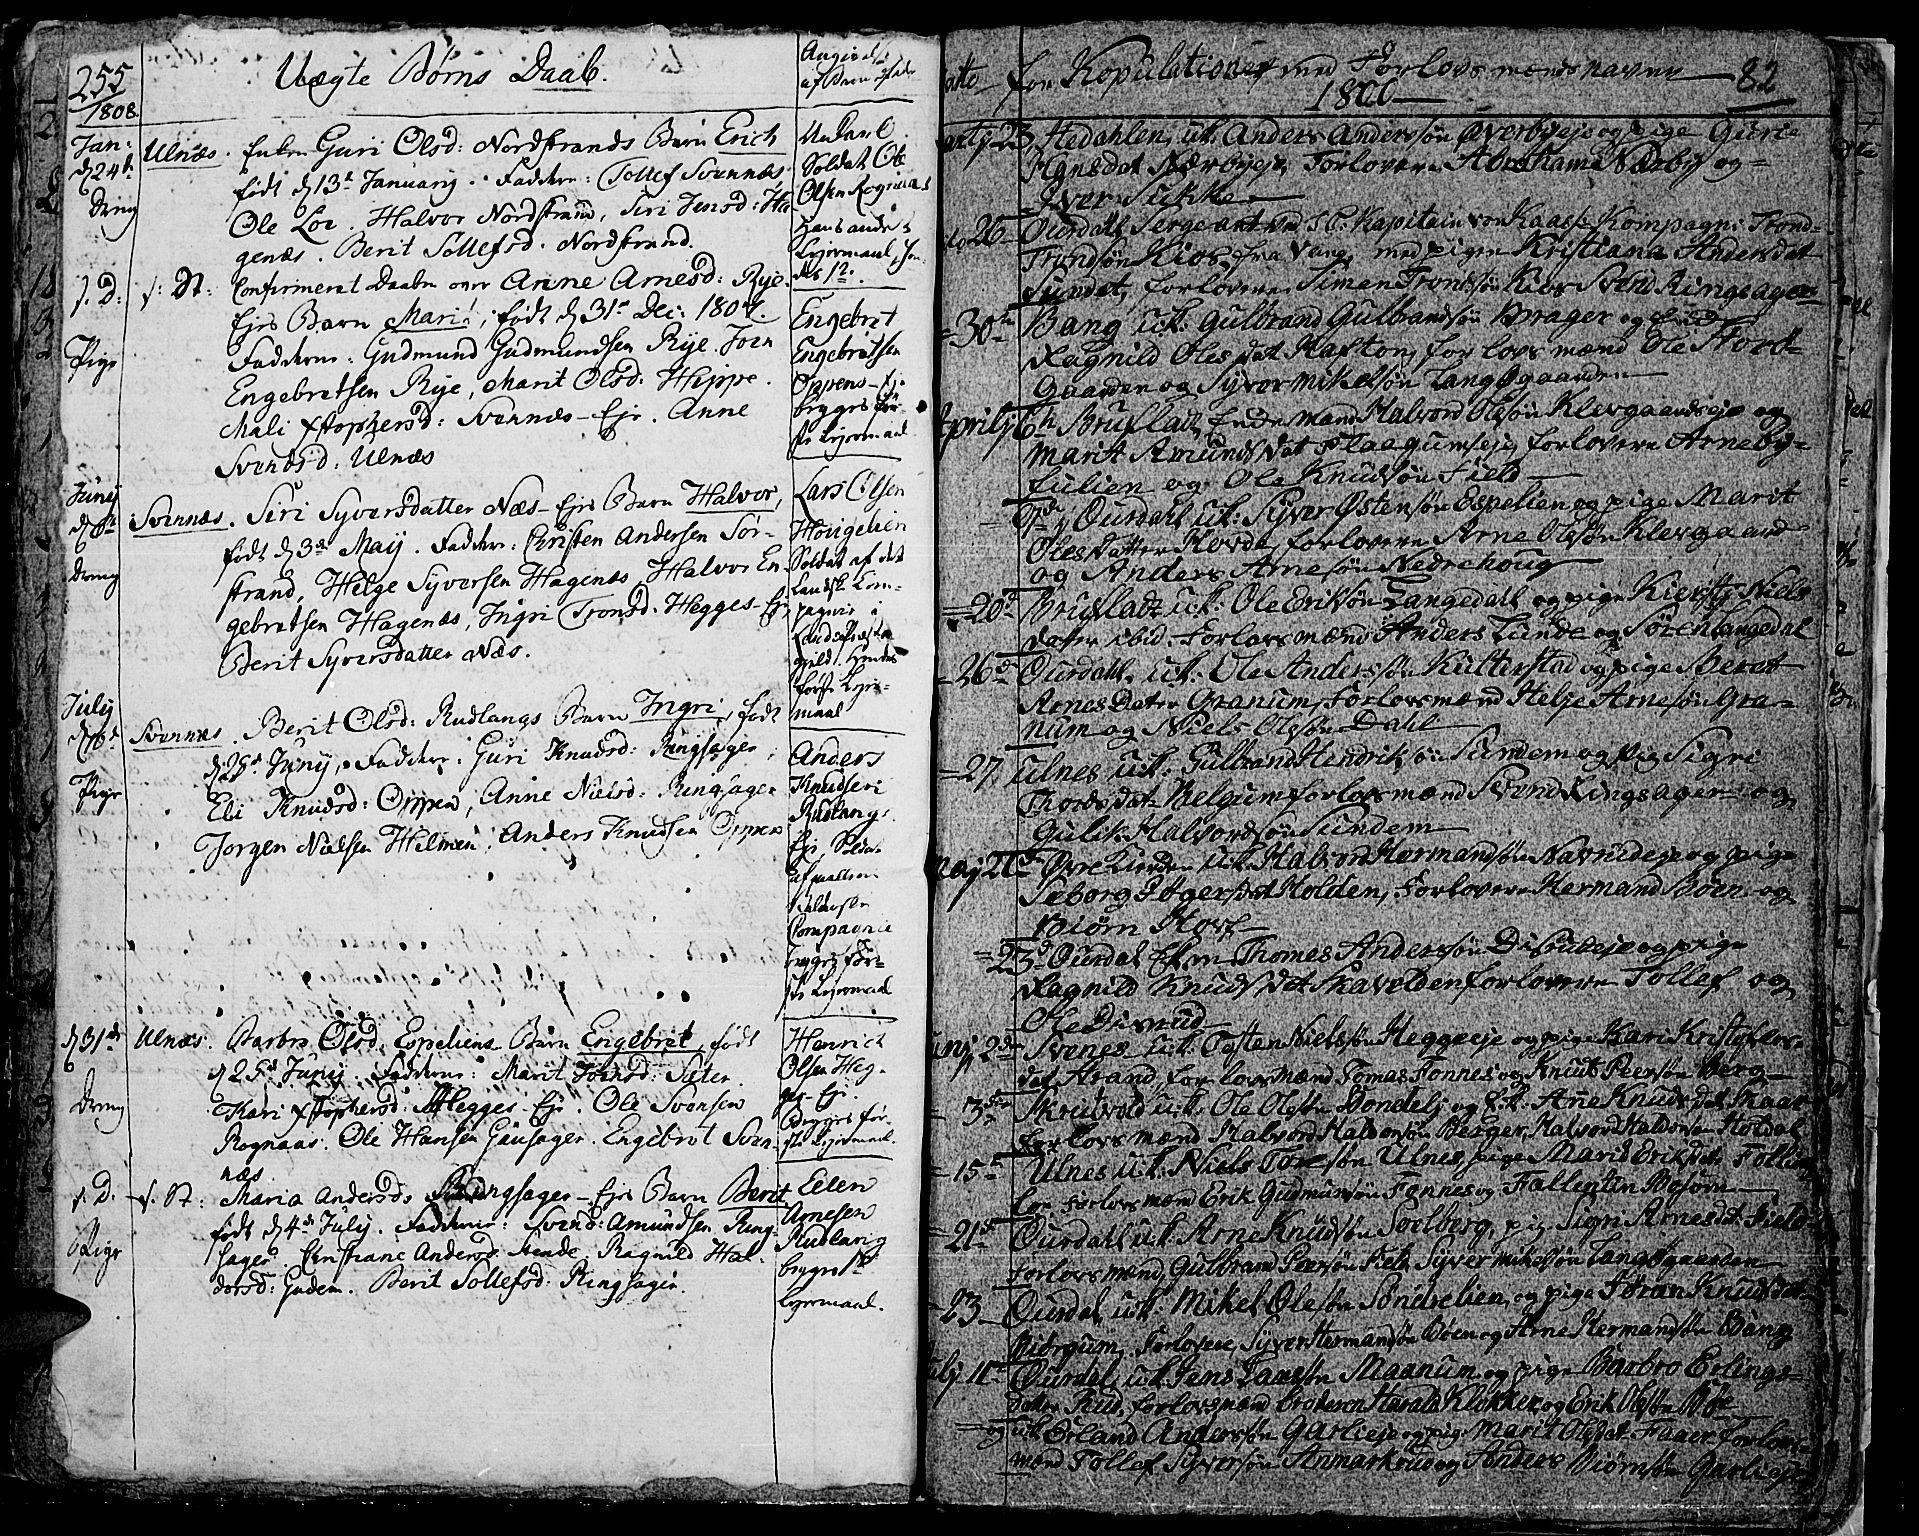 SAH, Aurdal prestekontor, Ministerialbok nr. 7, 1800-1808, s. 82